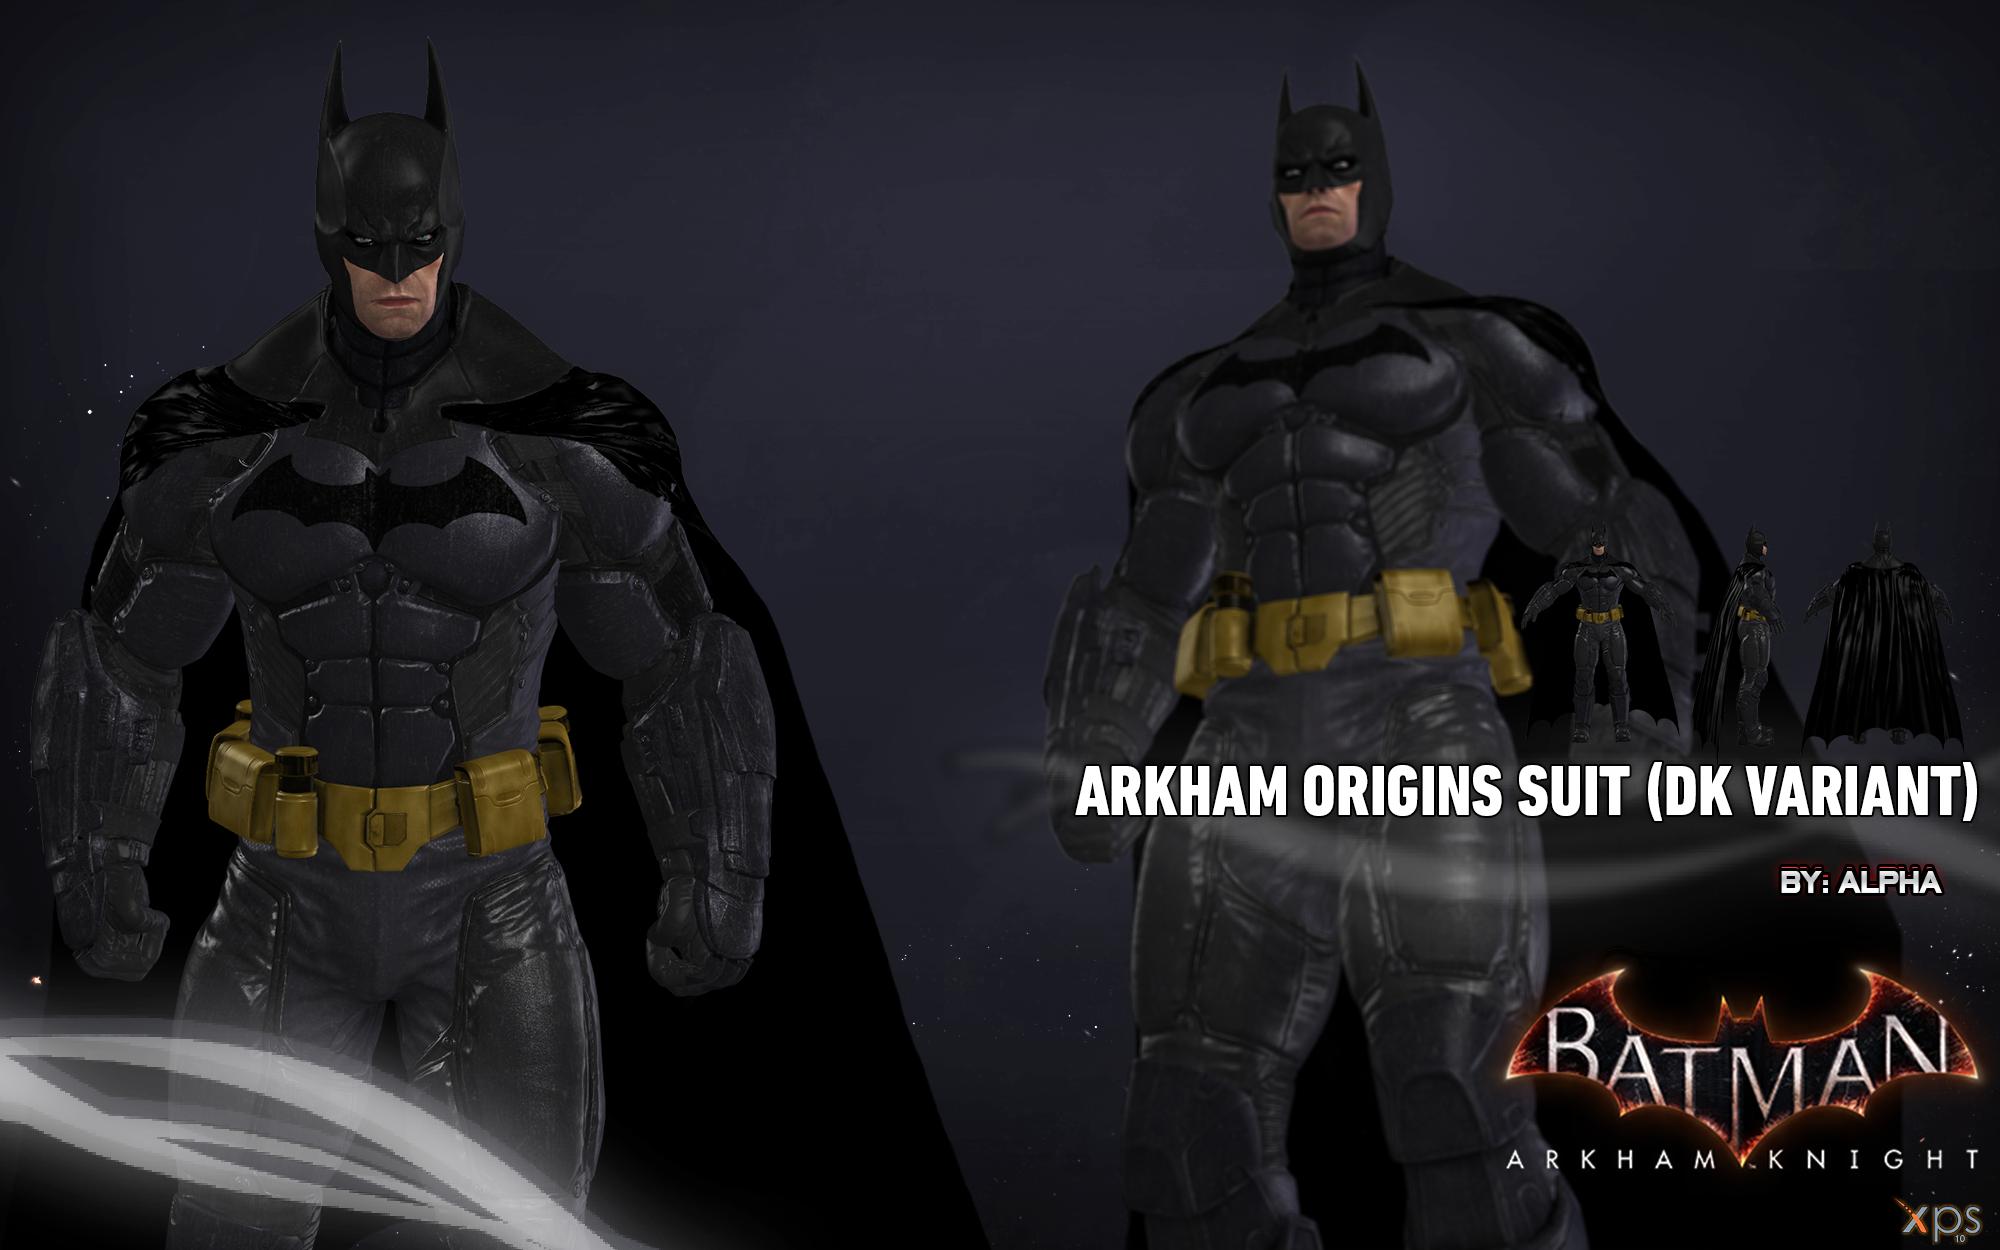 Batman arkham knight batman dk variant by xnasyndicate on deviantart batman arkham knight batman dk variant by xnasyndicate voltagebd Choice Image